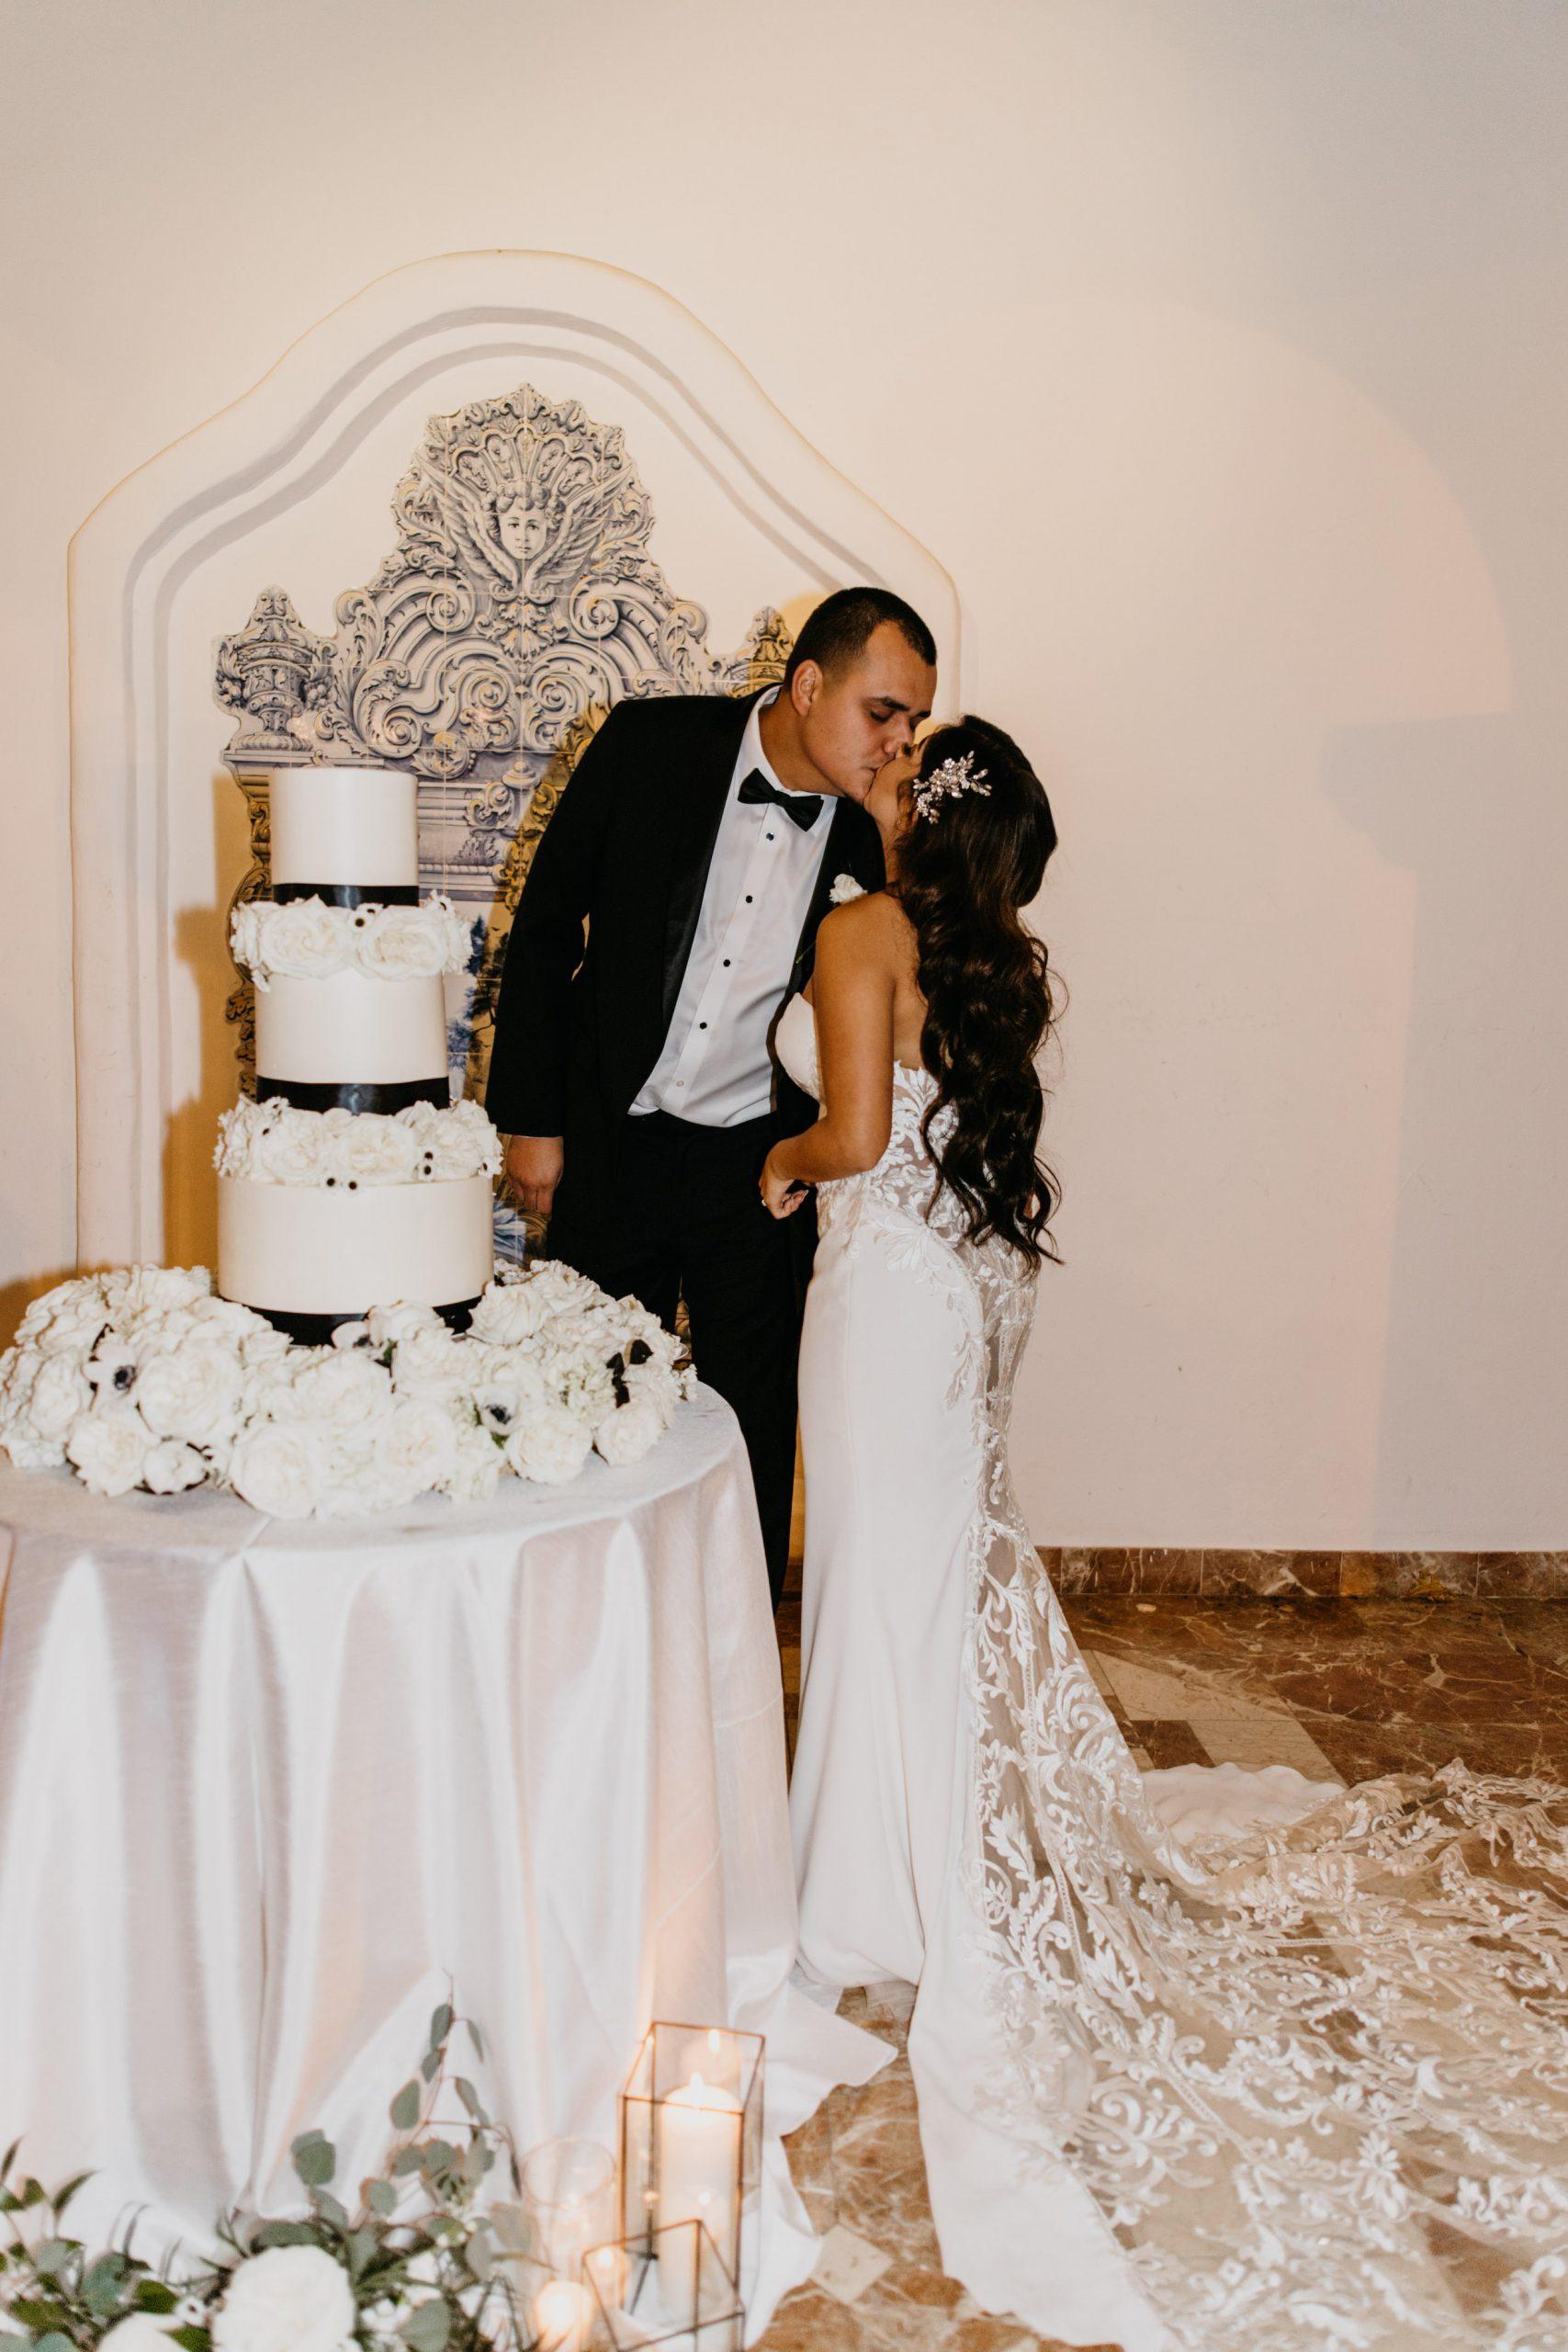 Bride and Groom Cutting Cake at Rancho Las Lomas Wedding, image by Fatima Elreda Photo